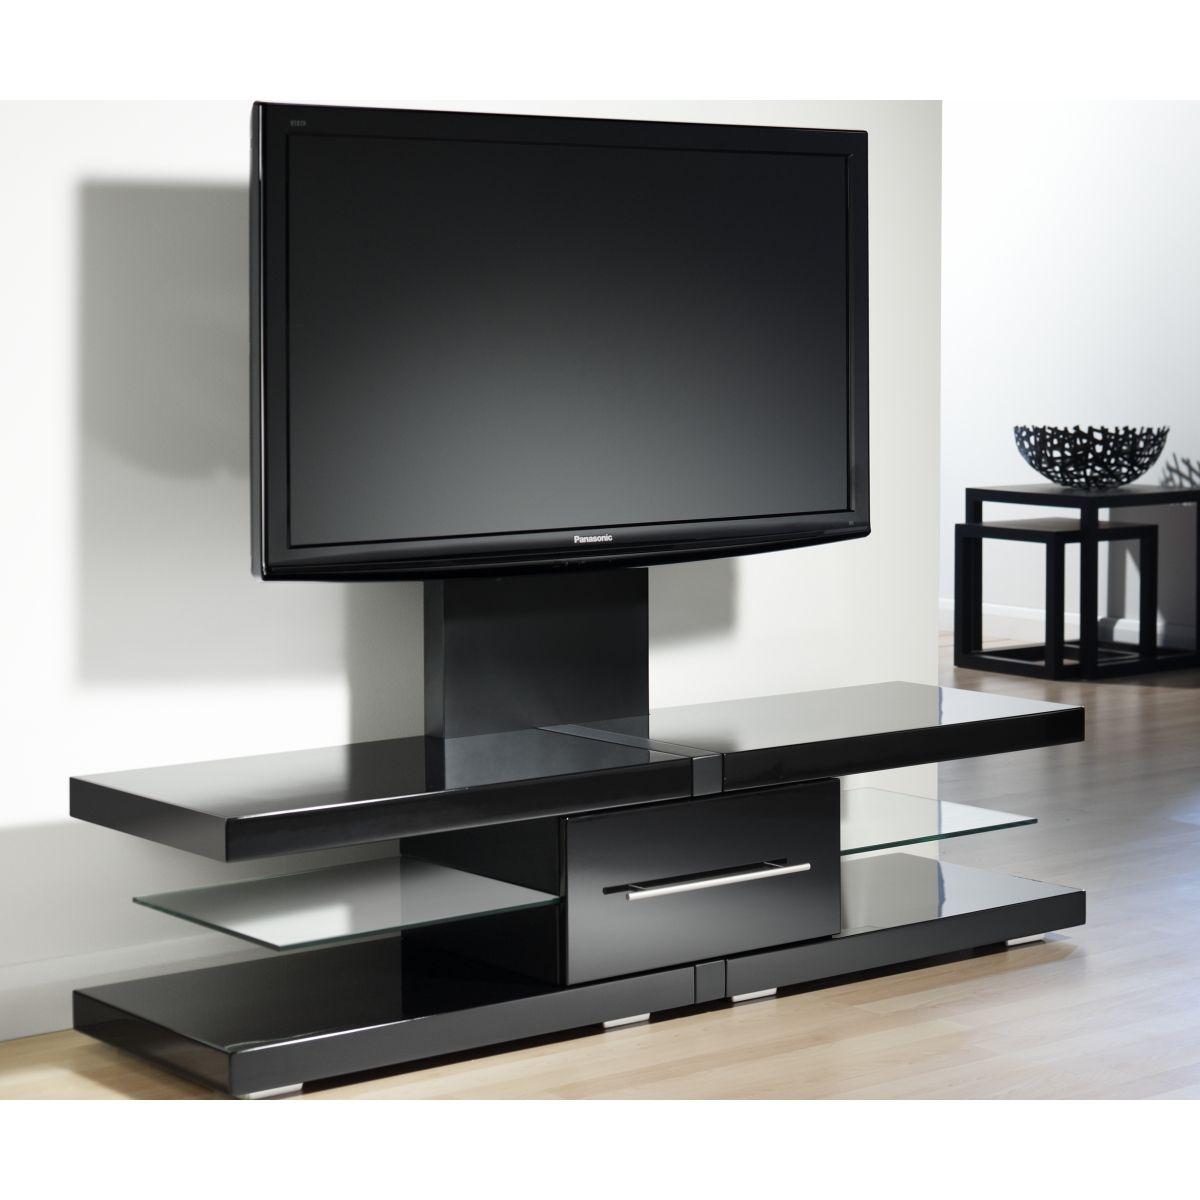 Effigy Of Cool Flat Screen Tv Stands With Mount Rak Renovasi